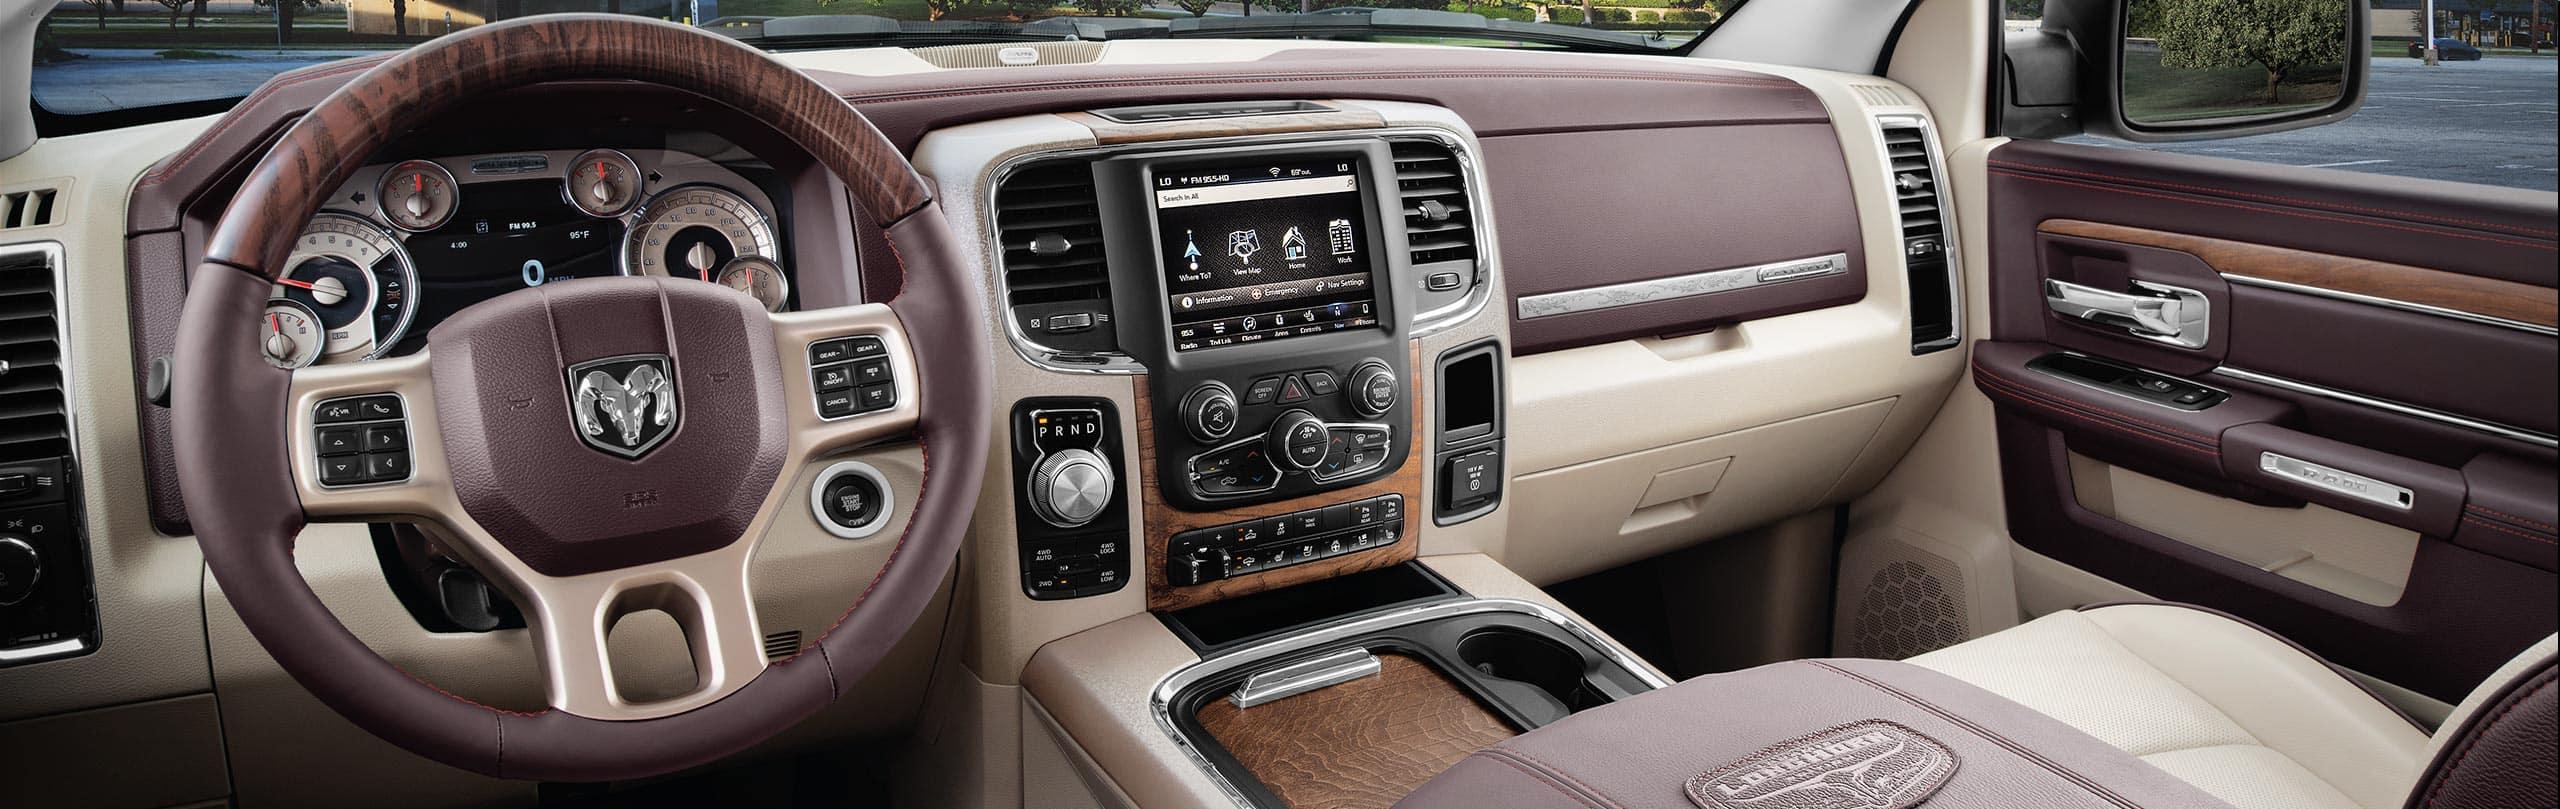 Amazing 2018 Ram Trucks Laramie Longhorn Southfork Edition Dashboard Pictures